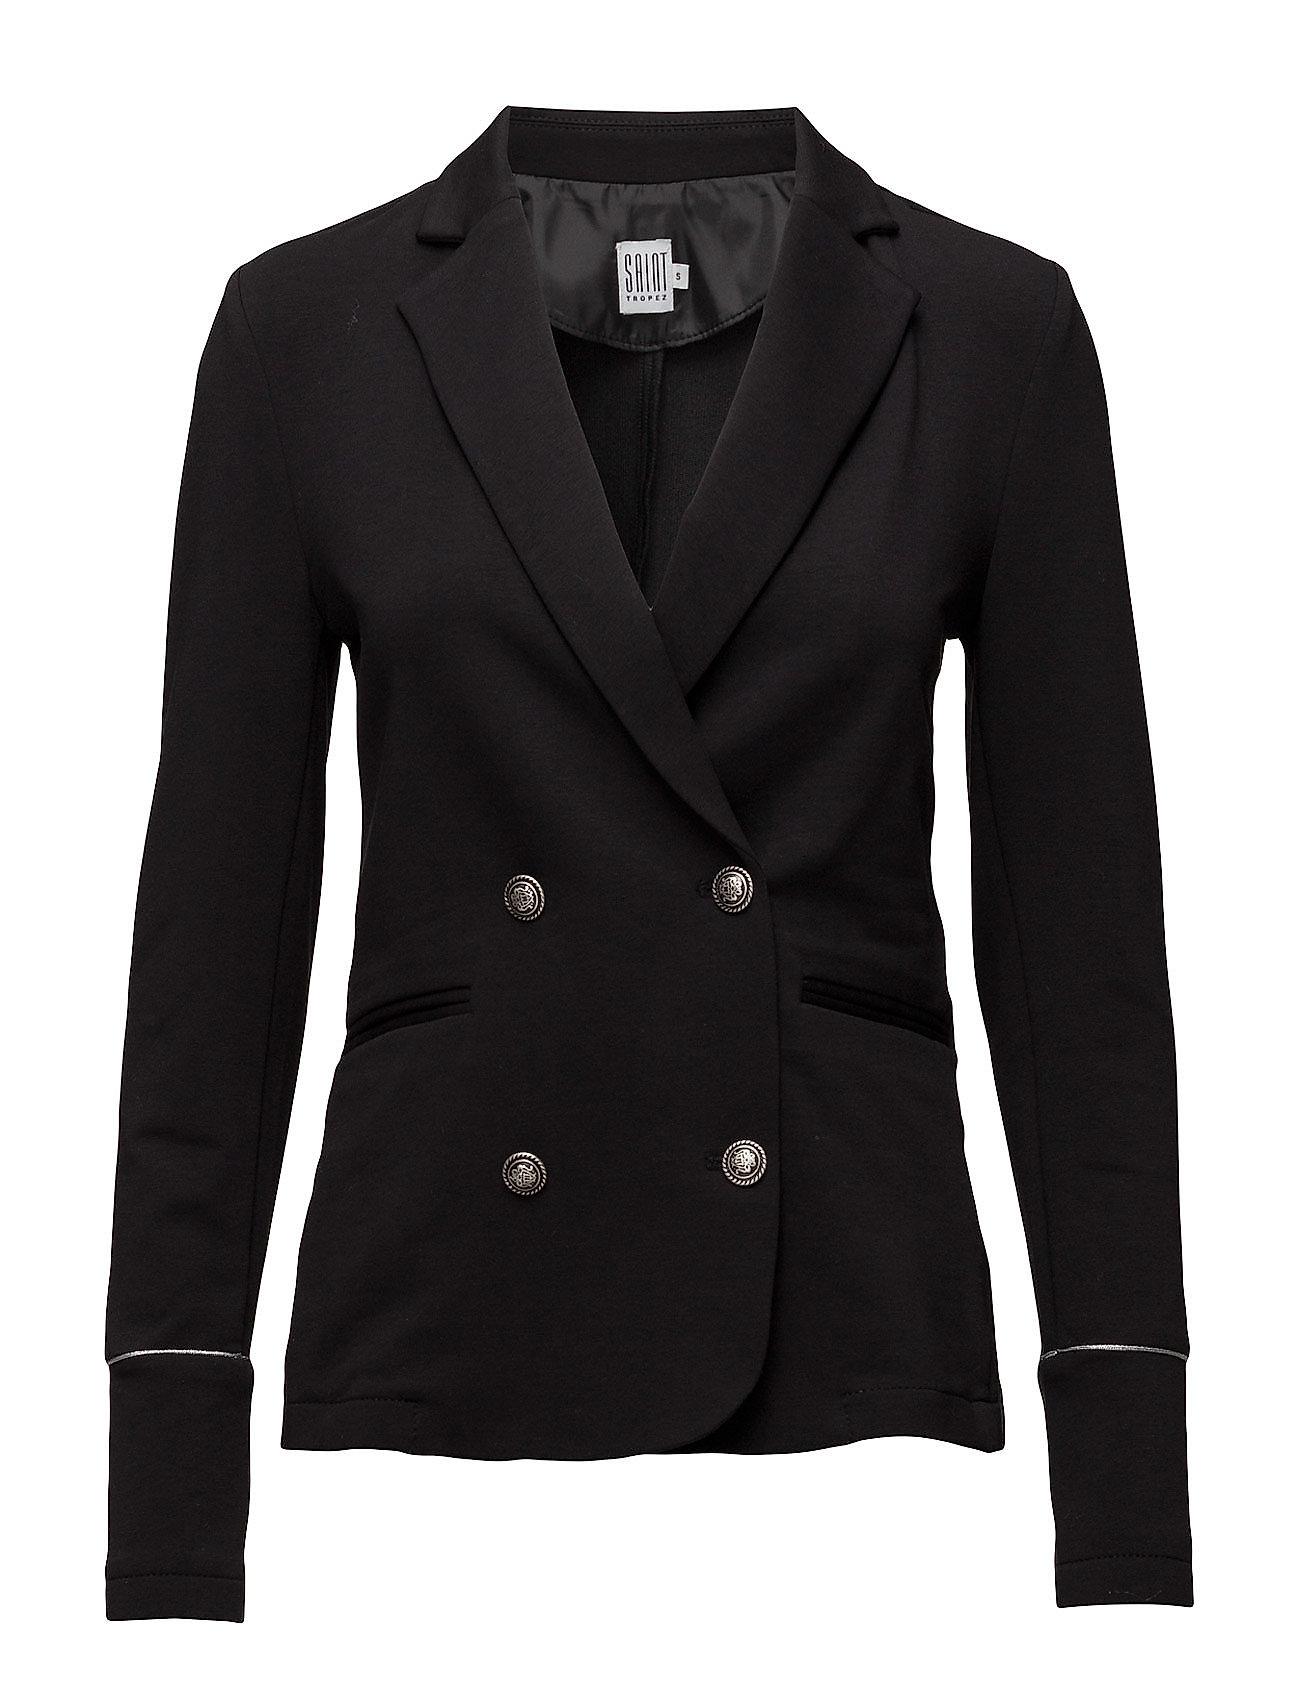 Jacket With Military Buttons Saint Tropez Blazere til Damer i Sort